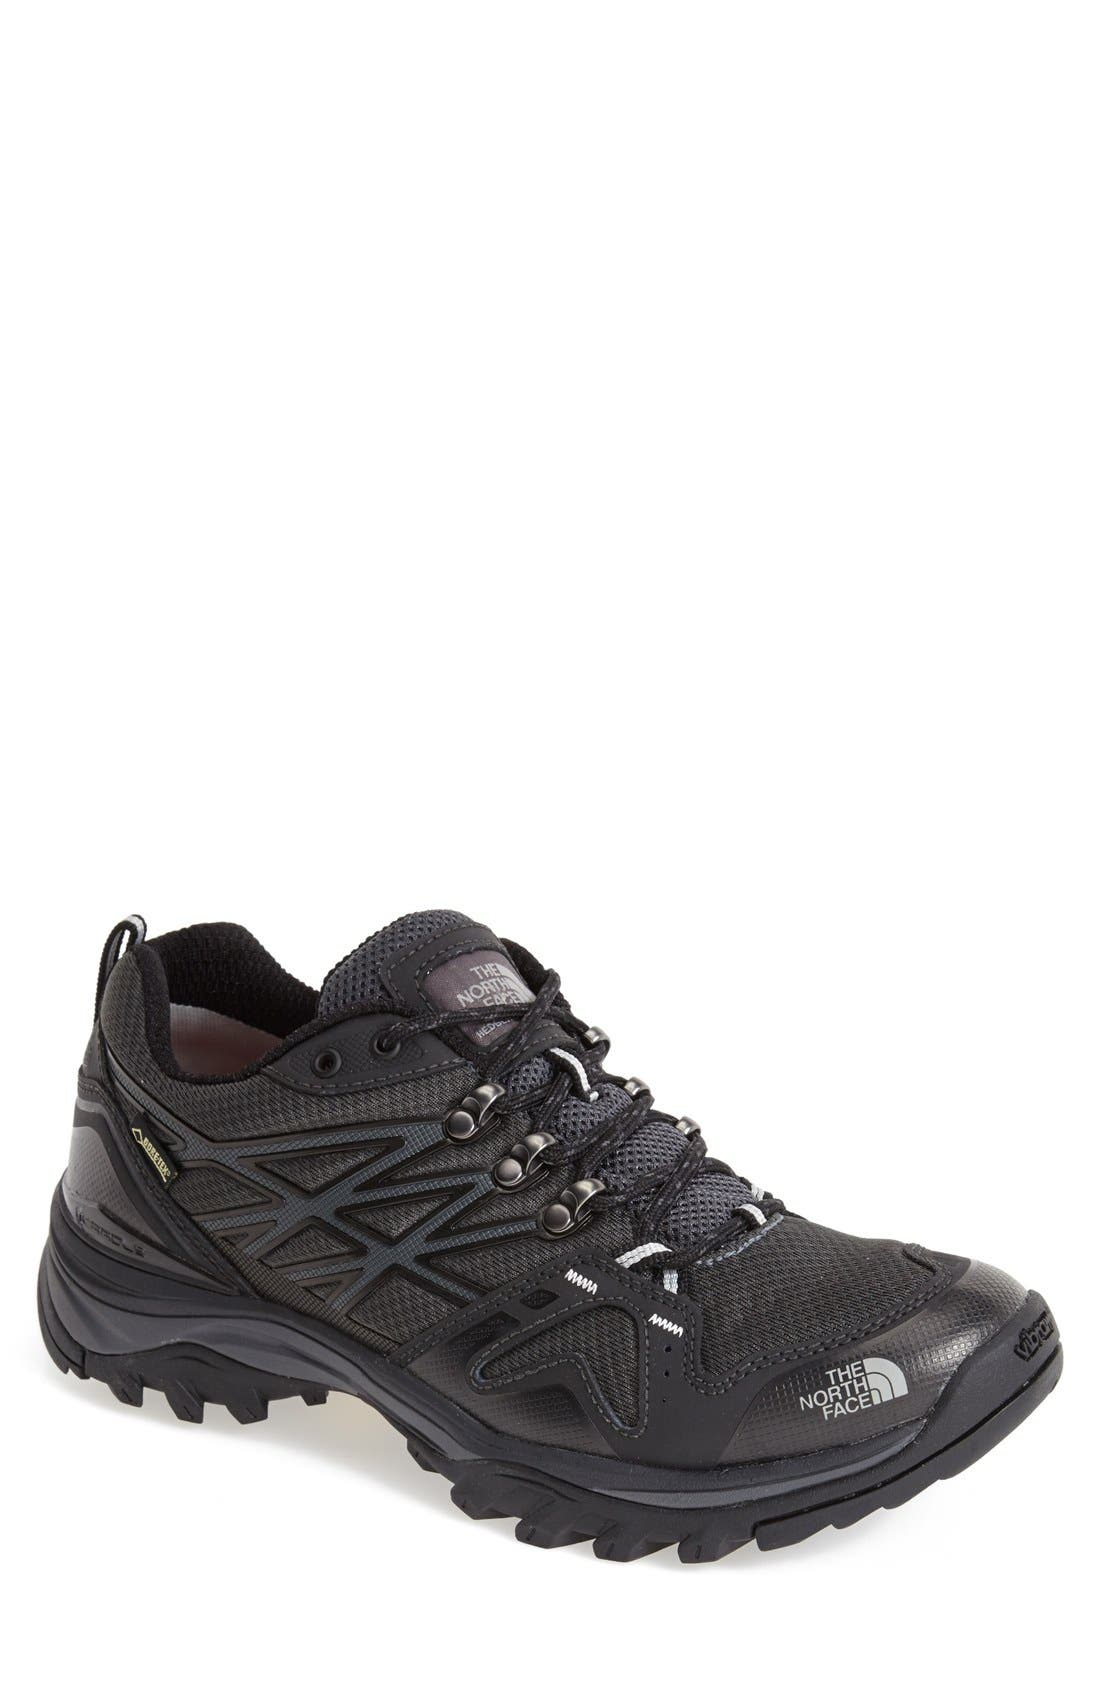 'Hedgehog Fastpack' Gore-Tex<sup>®</sup> Waterproof Hiking Shoe,                             Main thumbnail 1, color,                             001